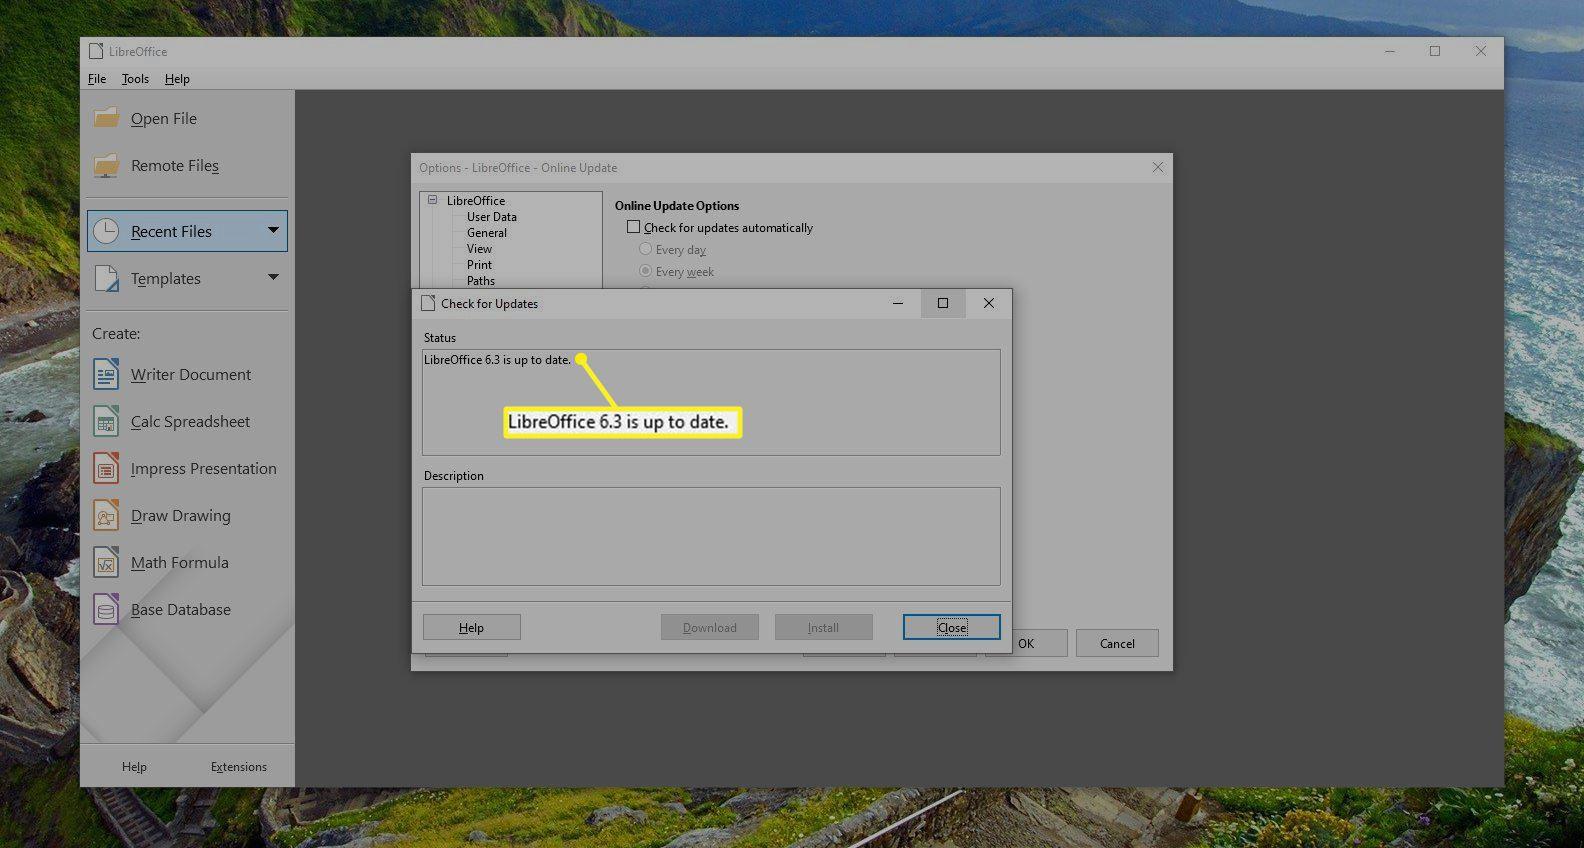 LibreOffice update status window